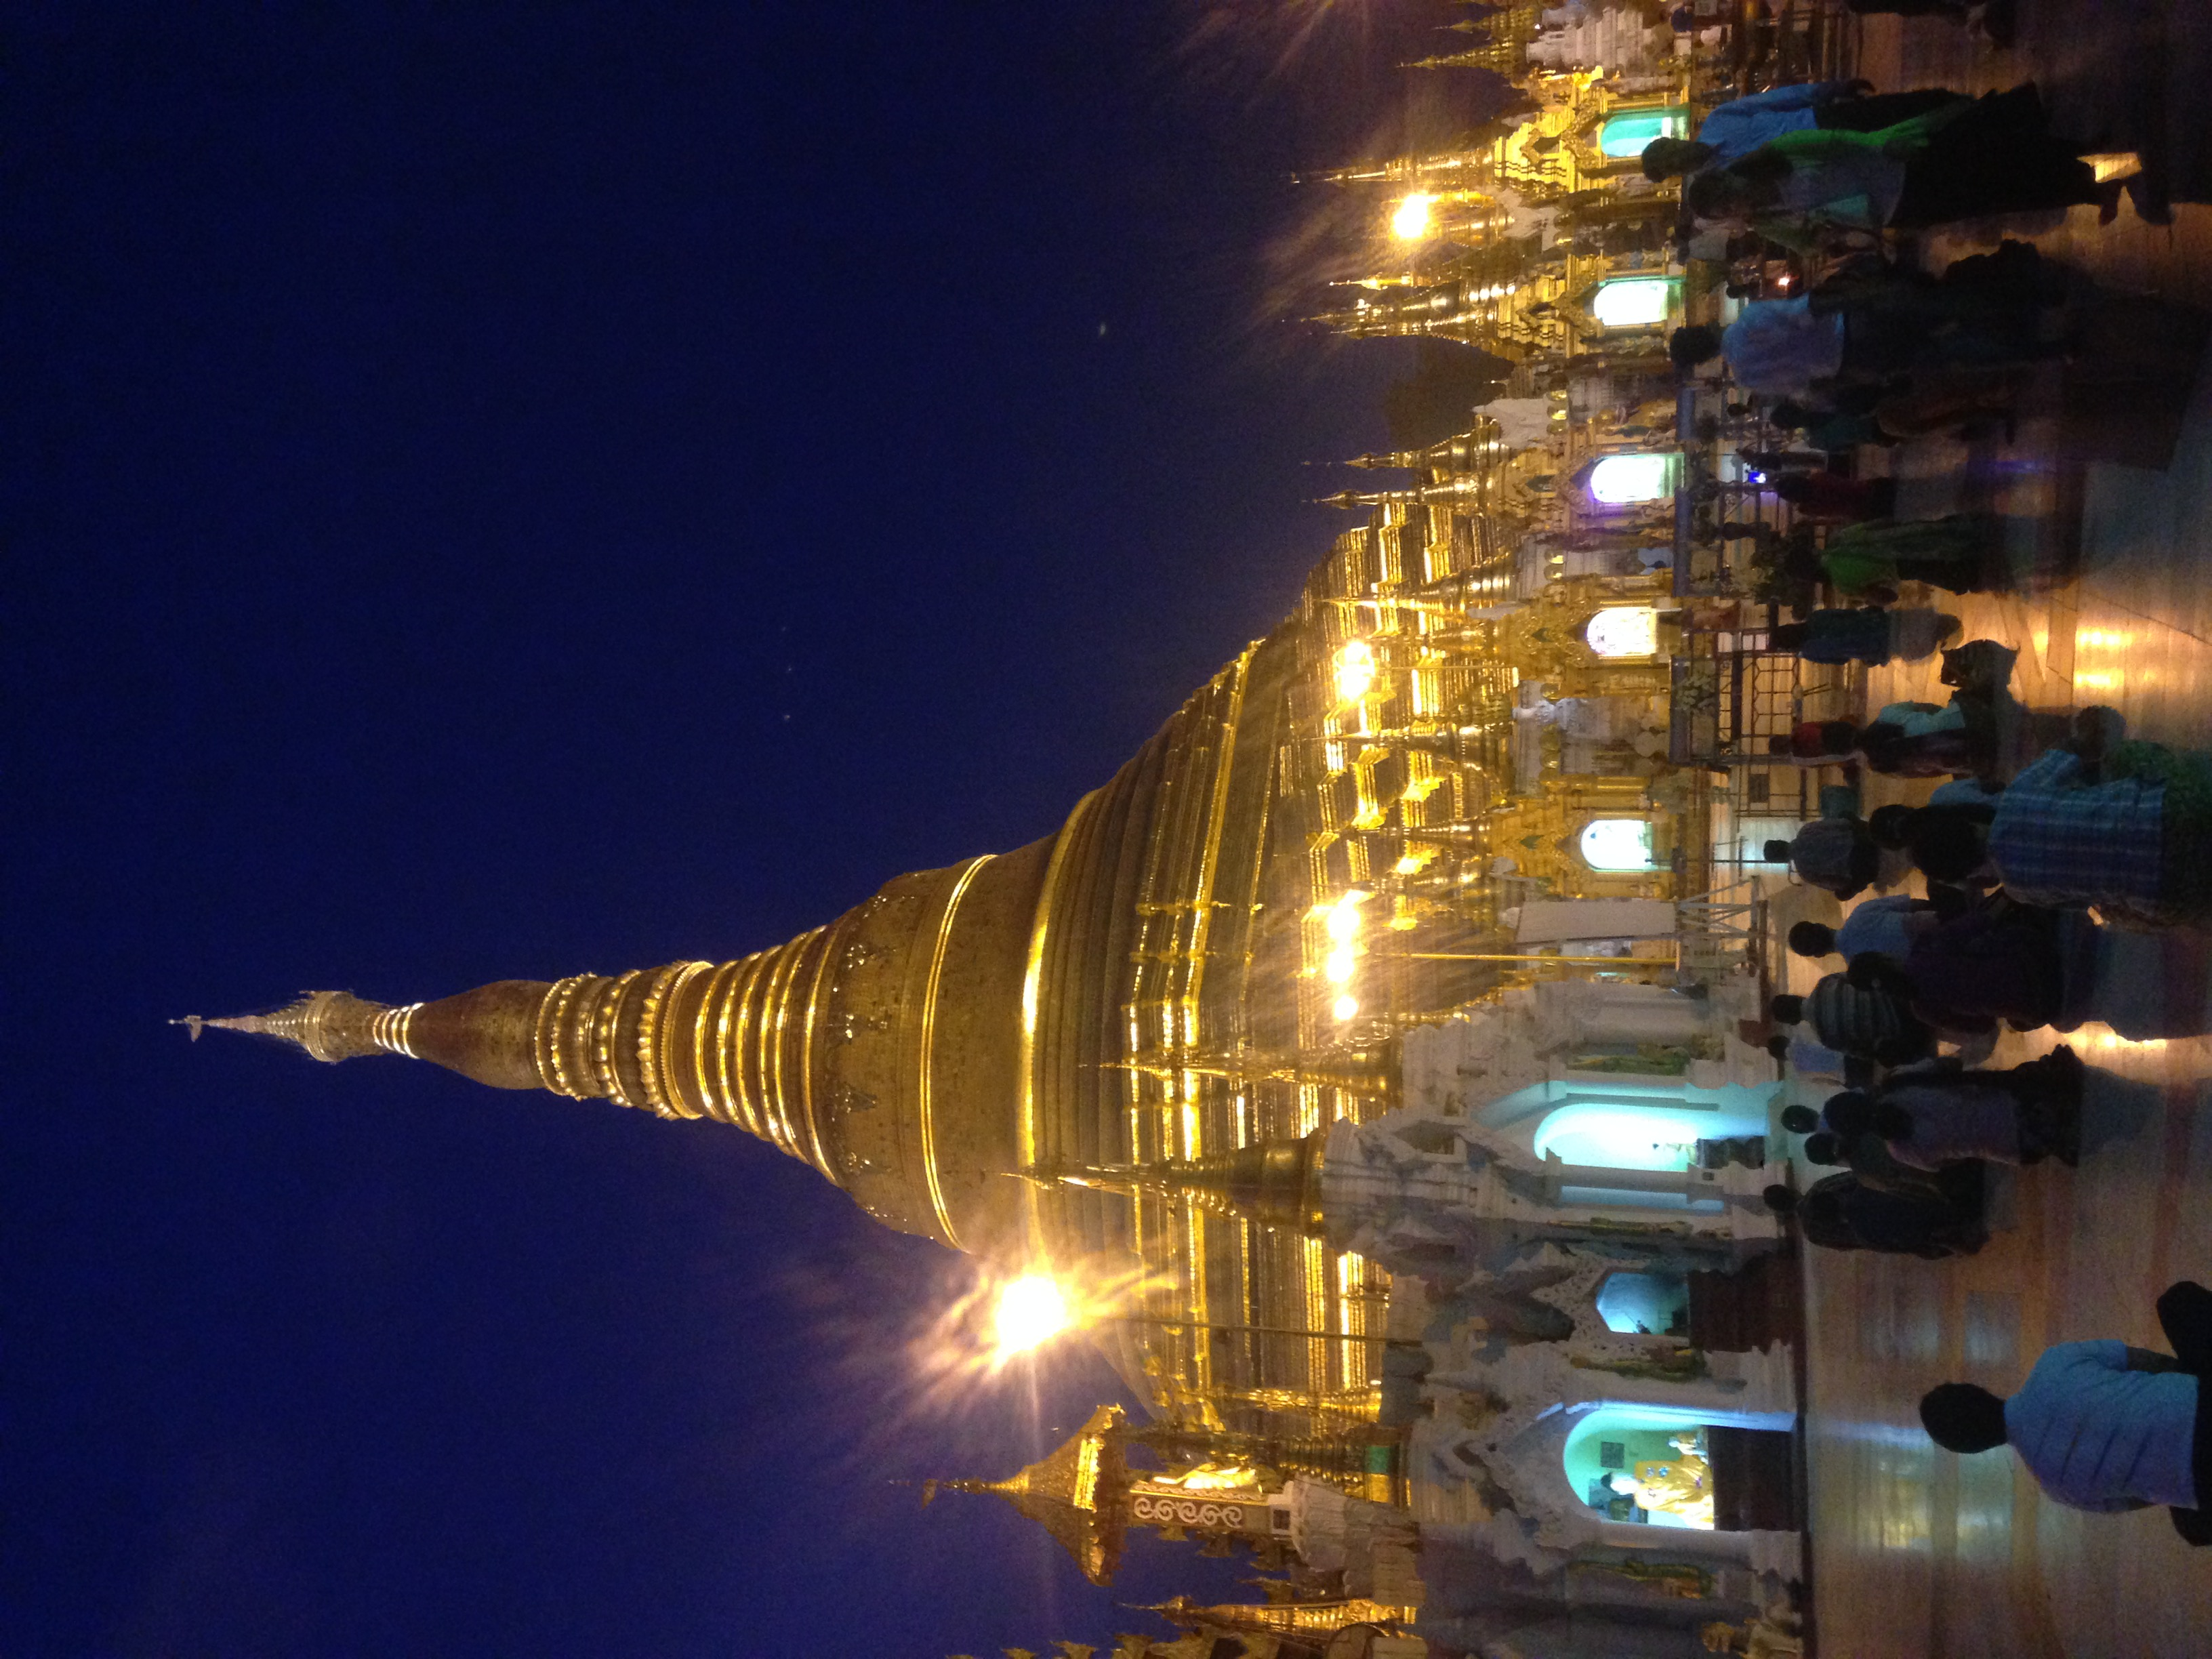 Praying at the Shwedagon Pagoda in Yangon before sunrise